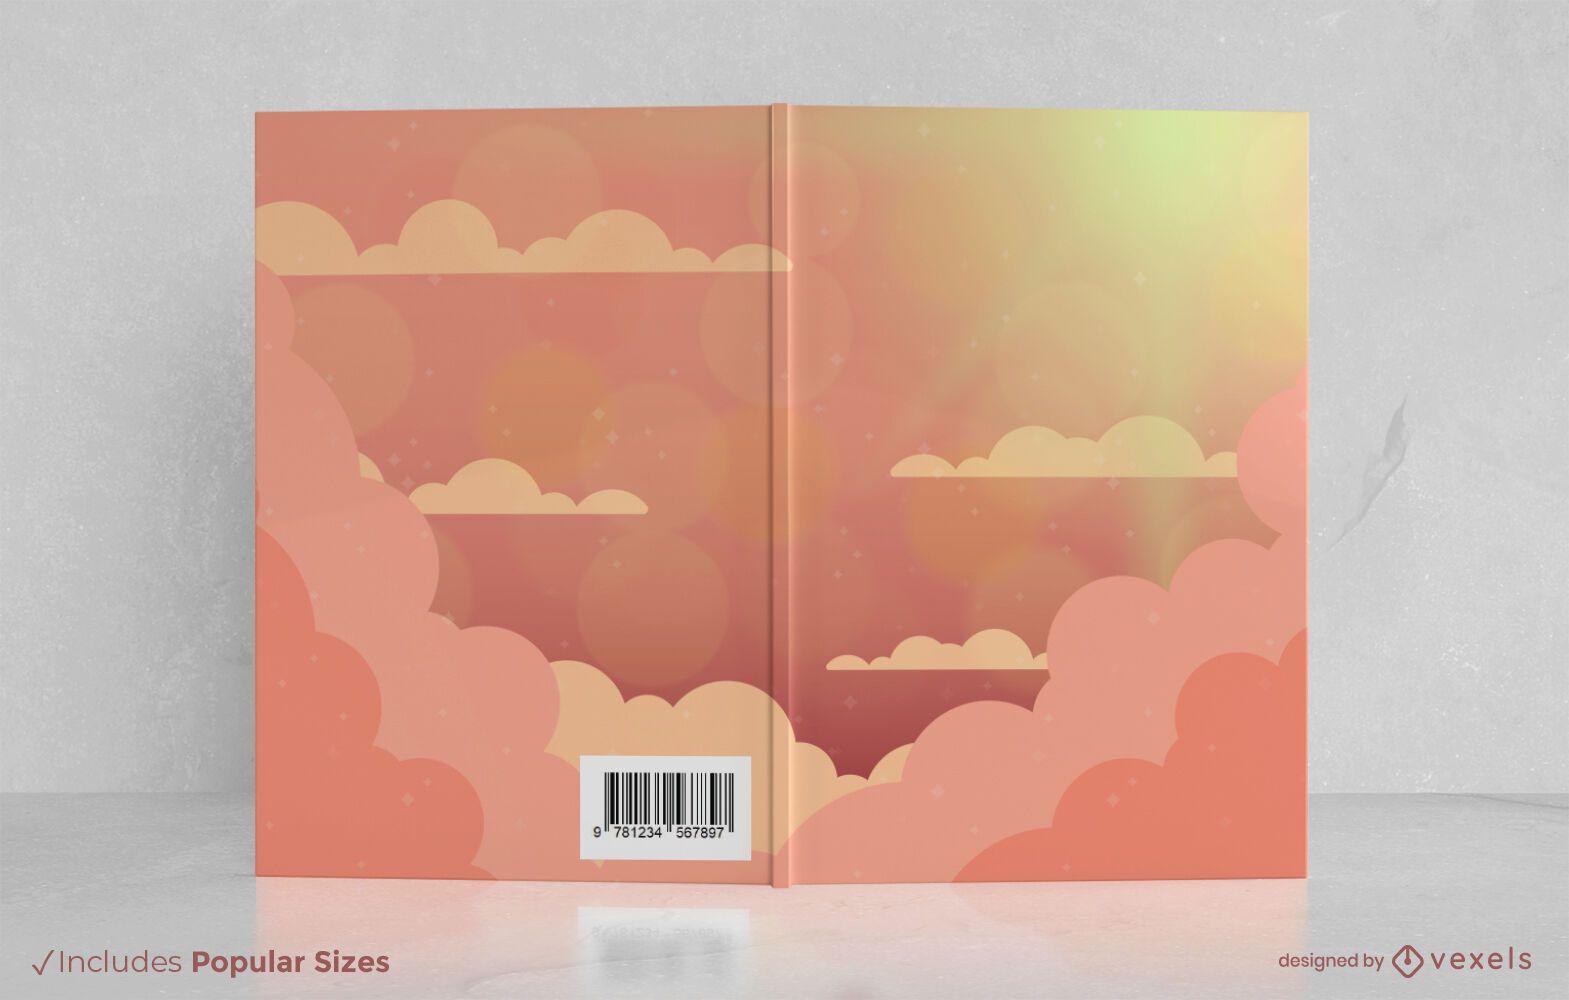 Cloudy sky book cover design